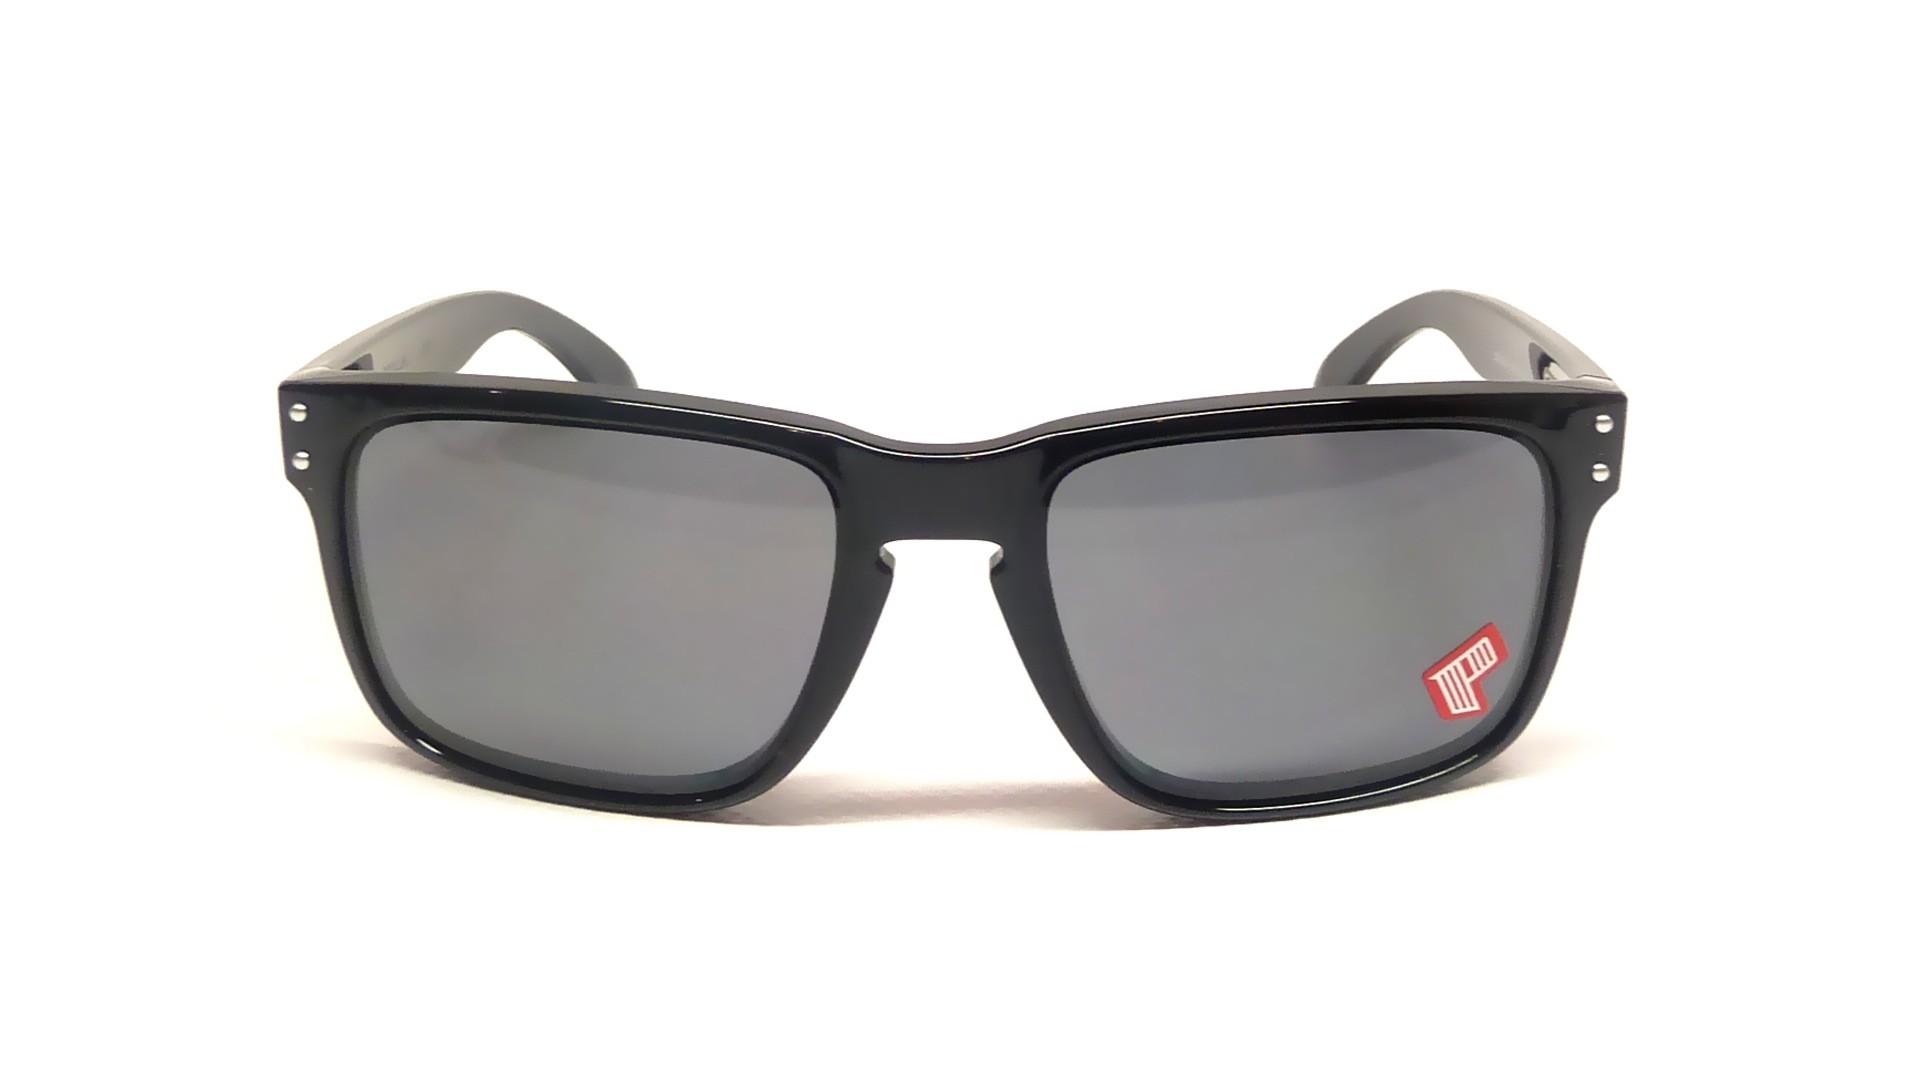 67ea8c474a Sunglasses Oakley Holbrook Black OO9102 02 55-18 Large Polarized